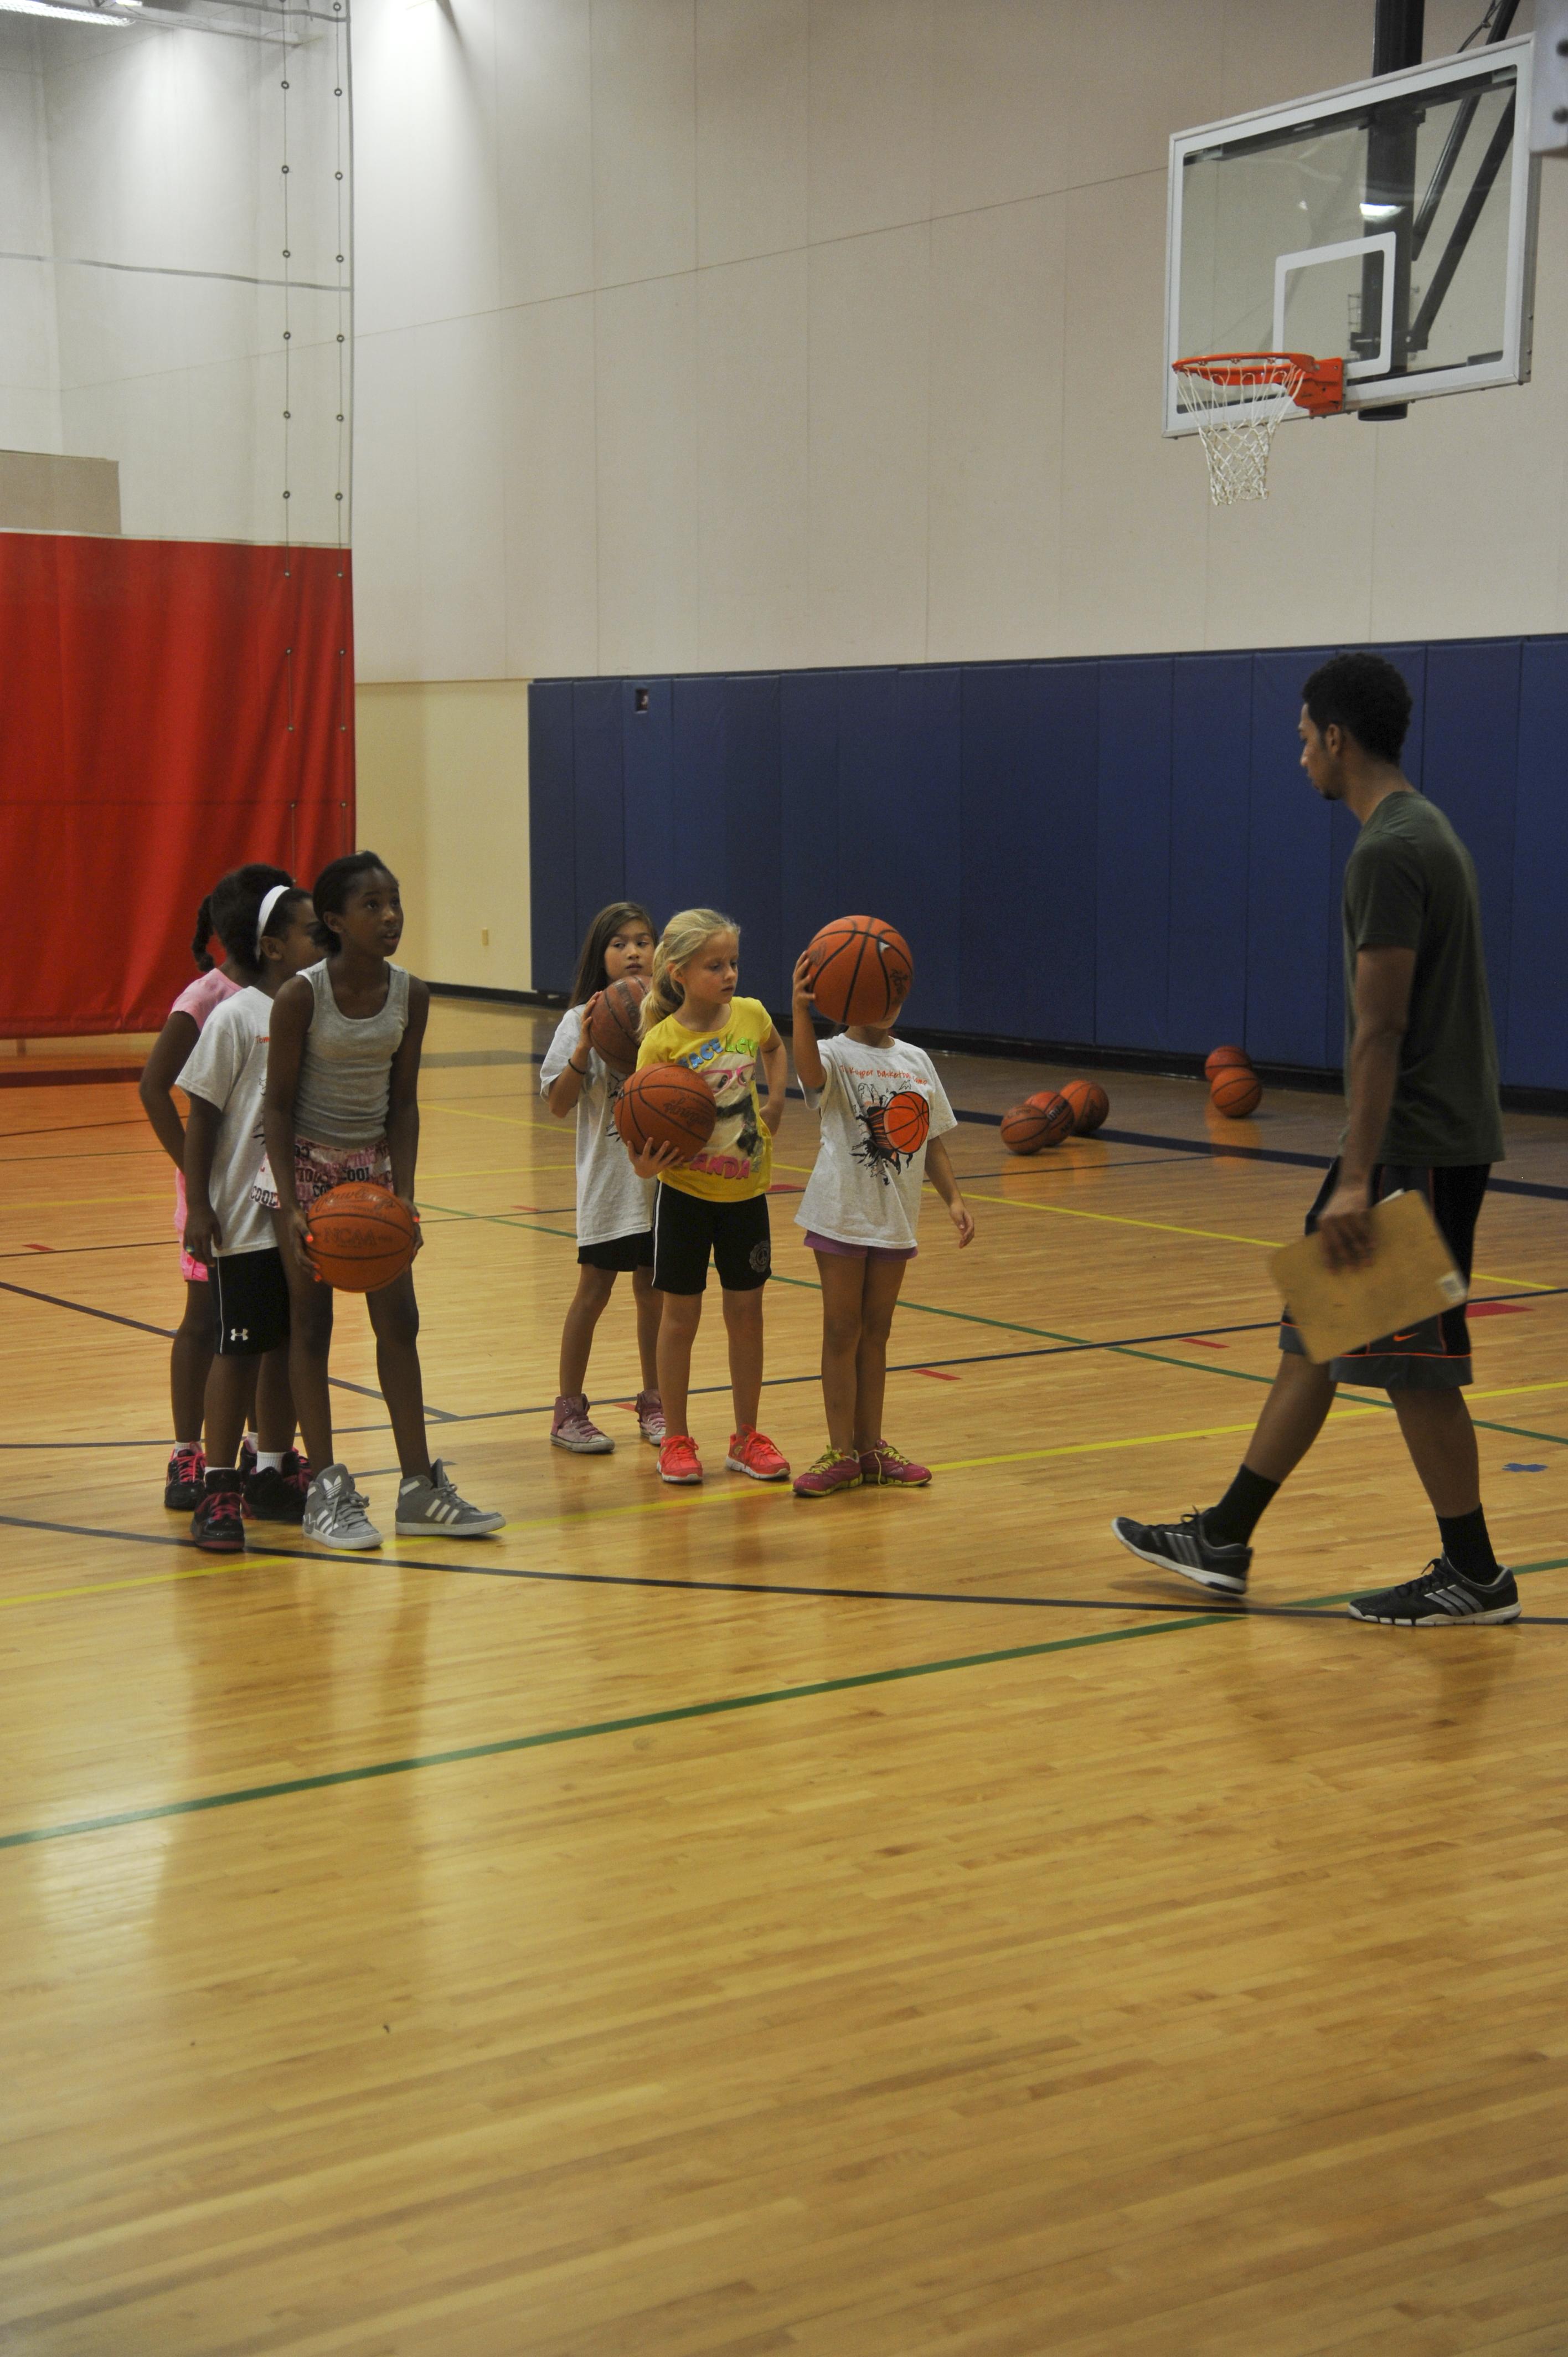 Basketball for Beginners: Improving Your Basketball Skills ...